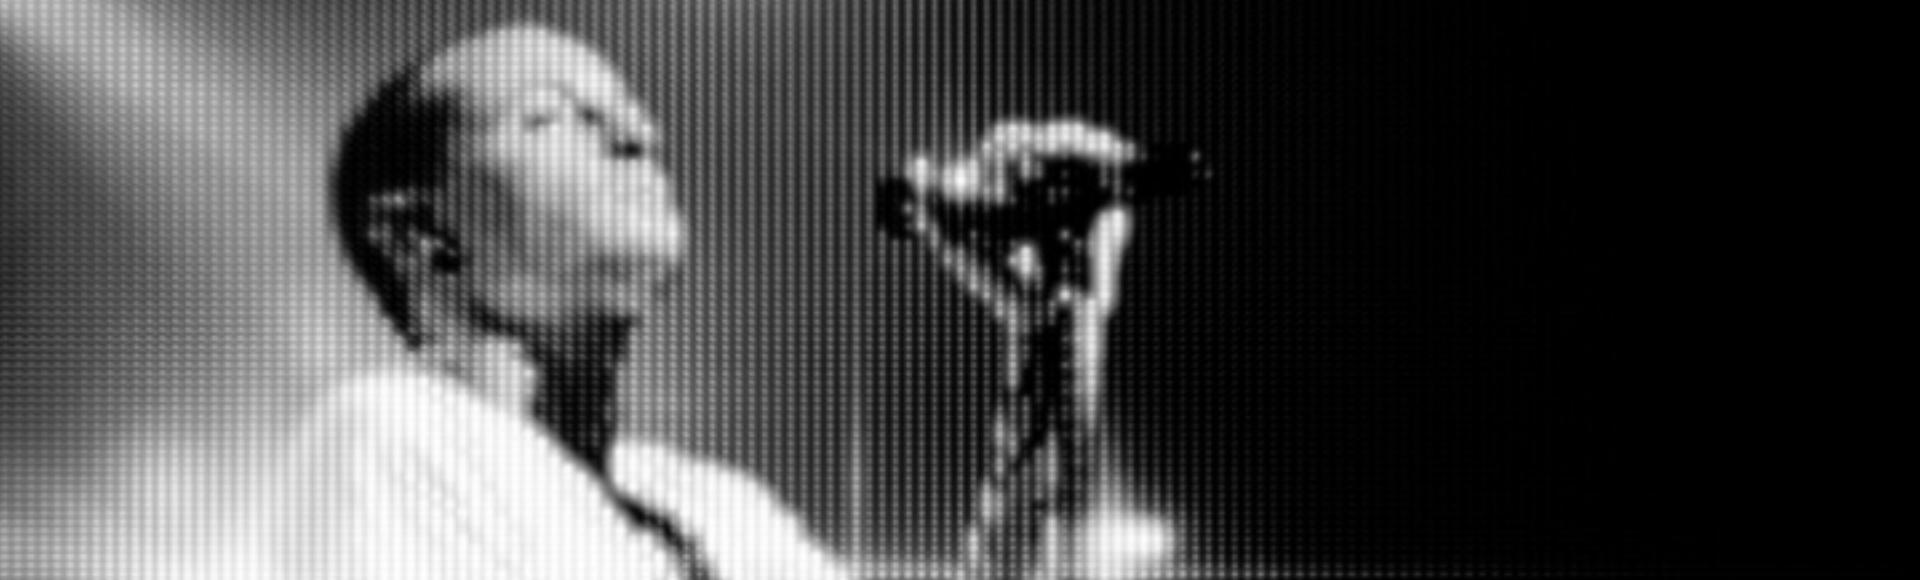 LP_Tsuns (0-00-07-04)_jpgm.jpg